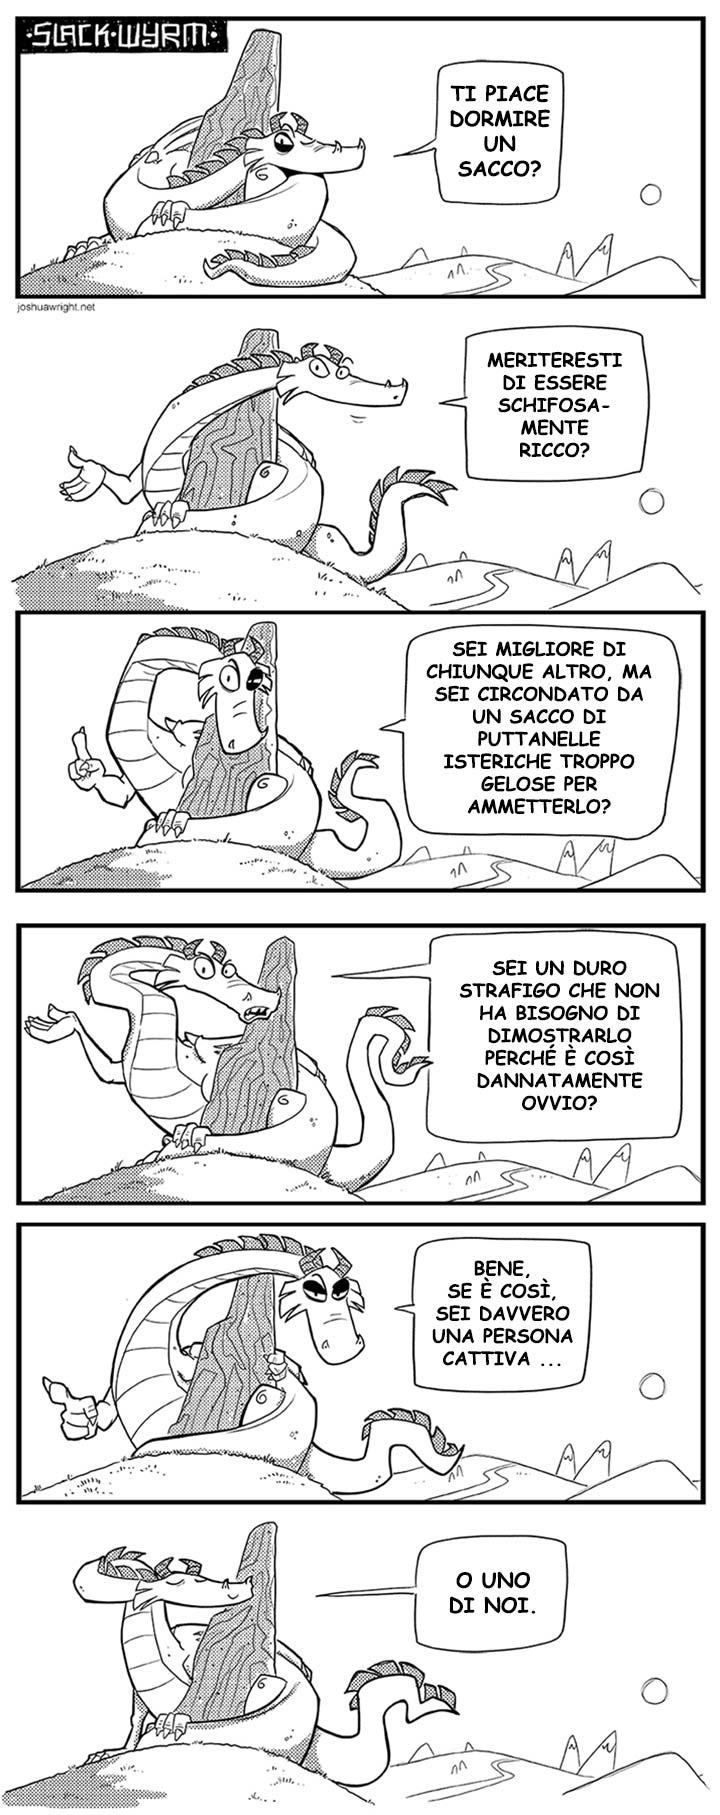 slack-wyrm-11-fumetto-fantasy